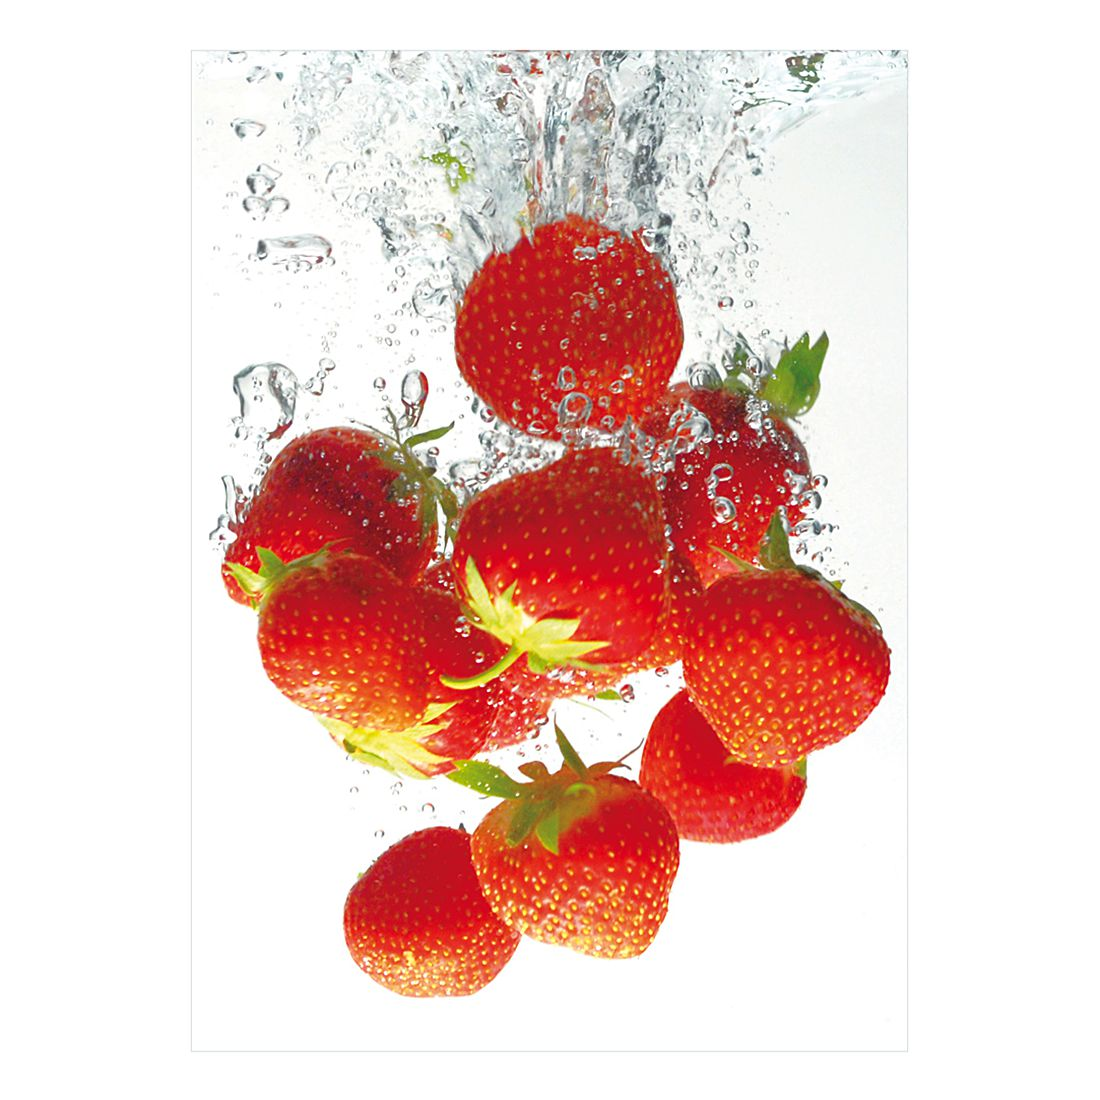 Fototapete Strawberry Bath, Mantiburi kaufen